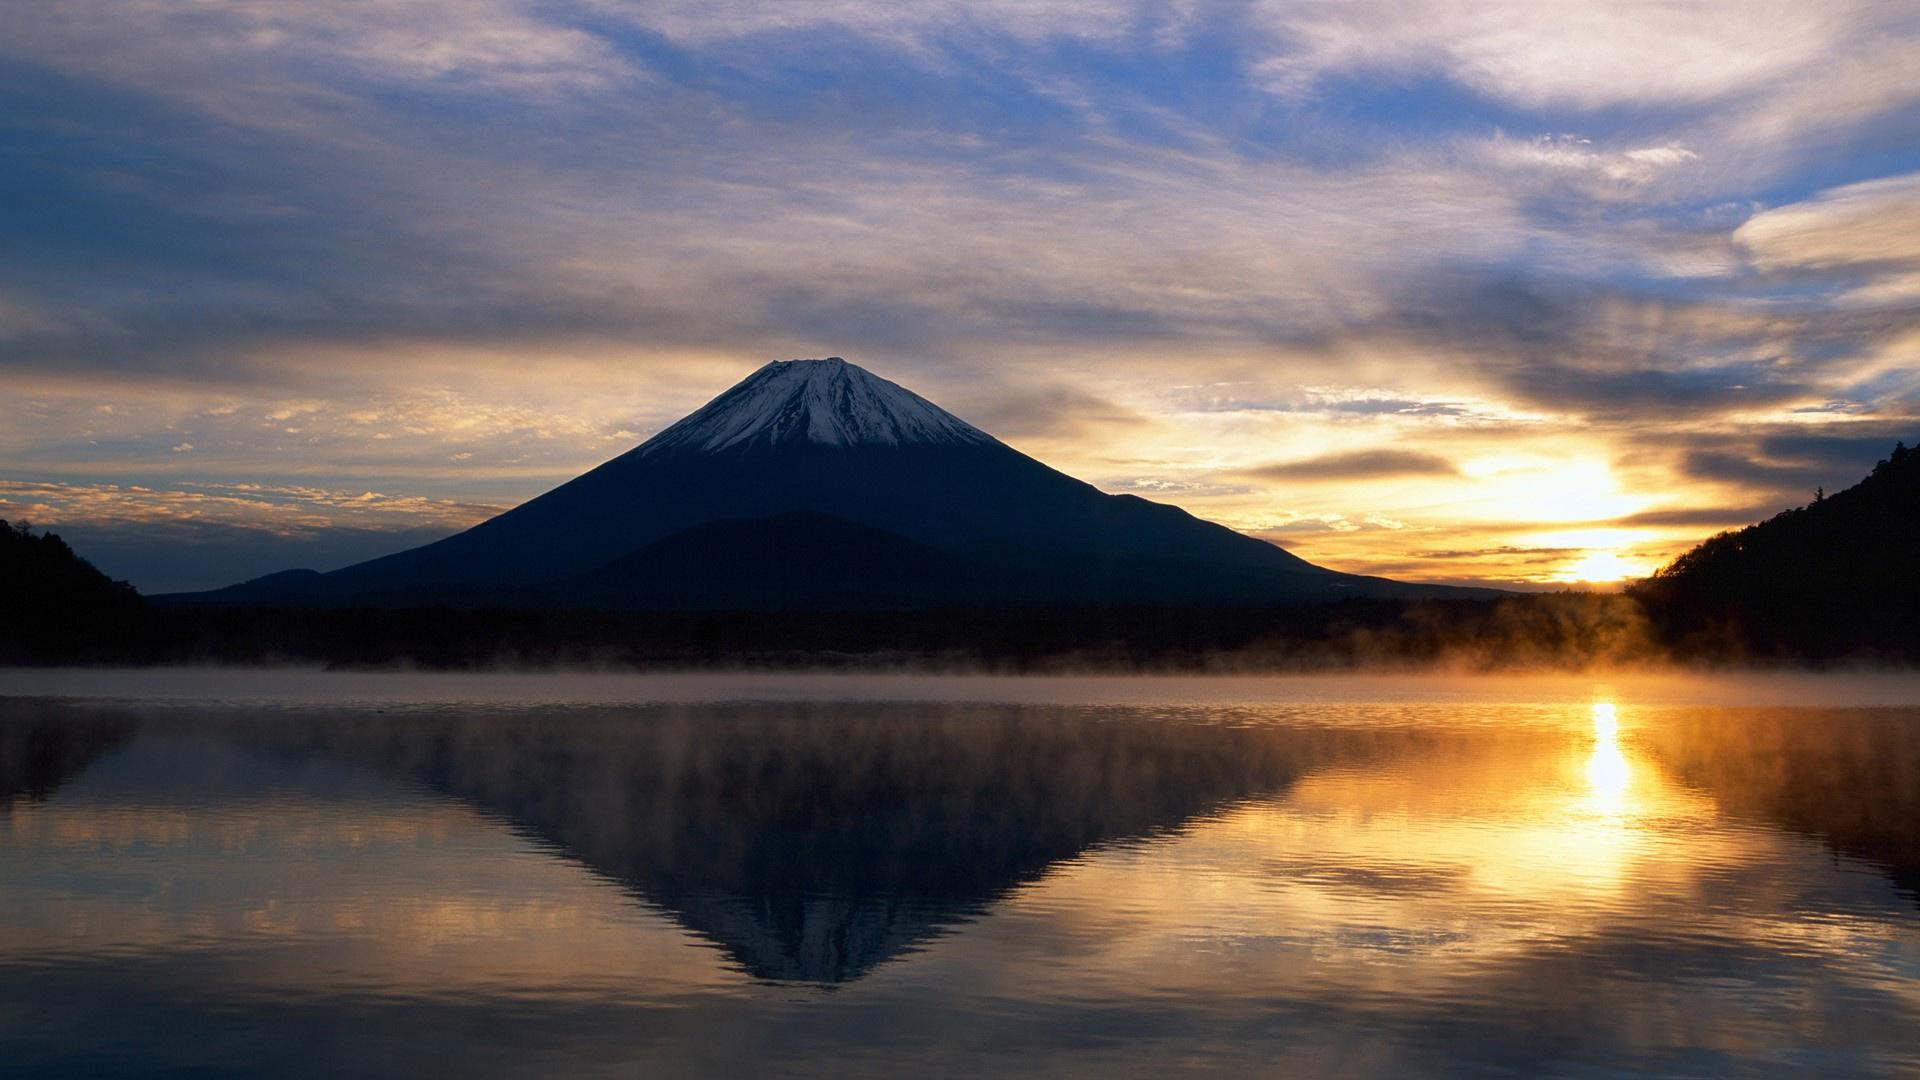 RT Mount Fuji Wallpapers